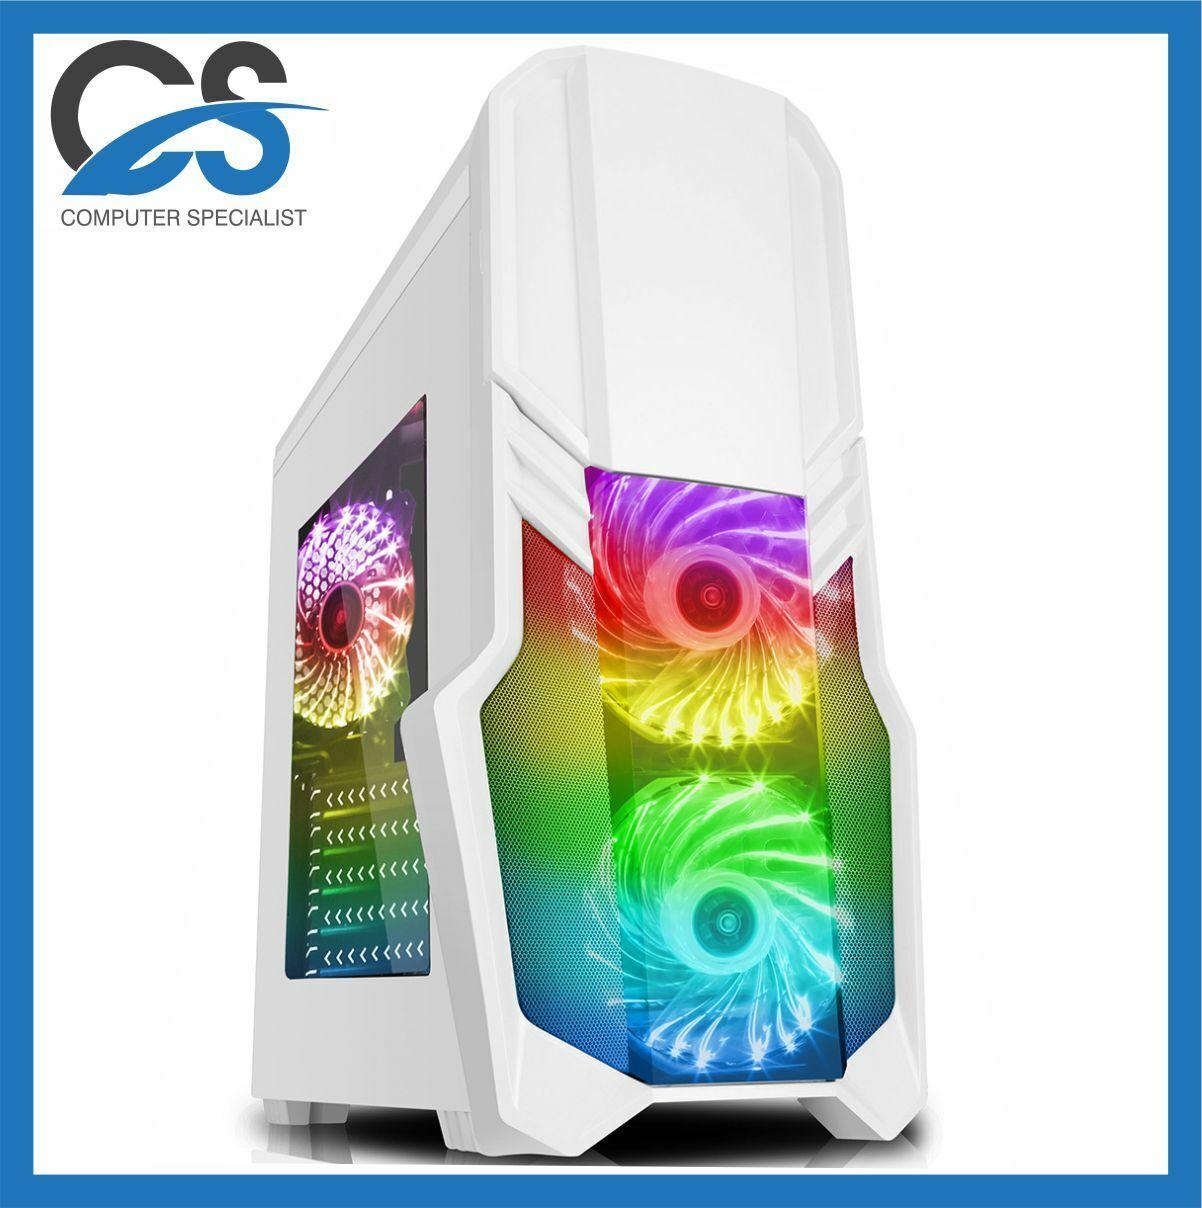 GForce Gaming PC Computer Intel i7 11700 11th Gen 2TB HDD 32GB RAM 6GB GTX 1660